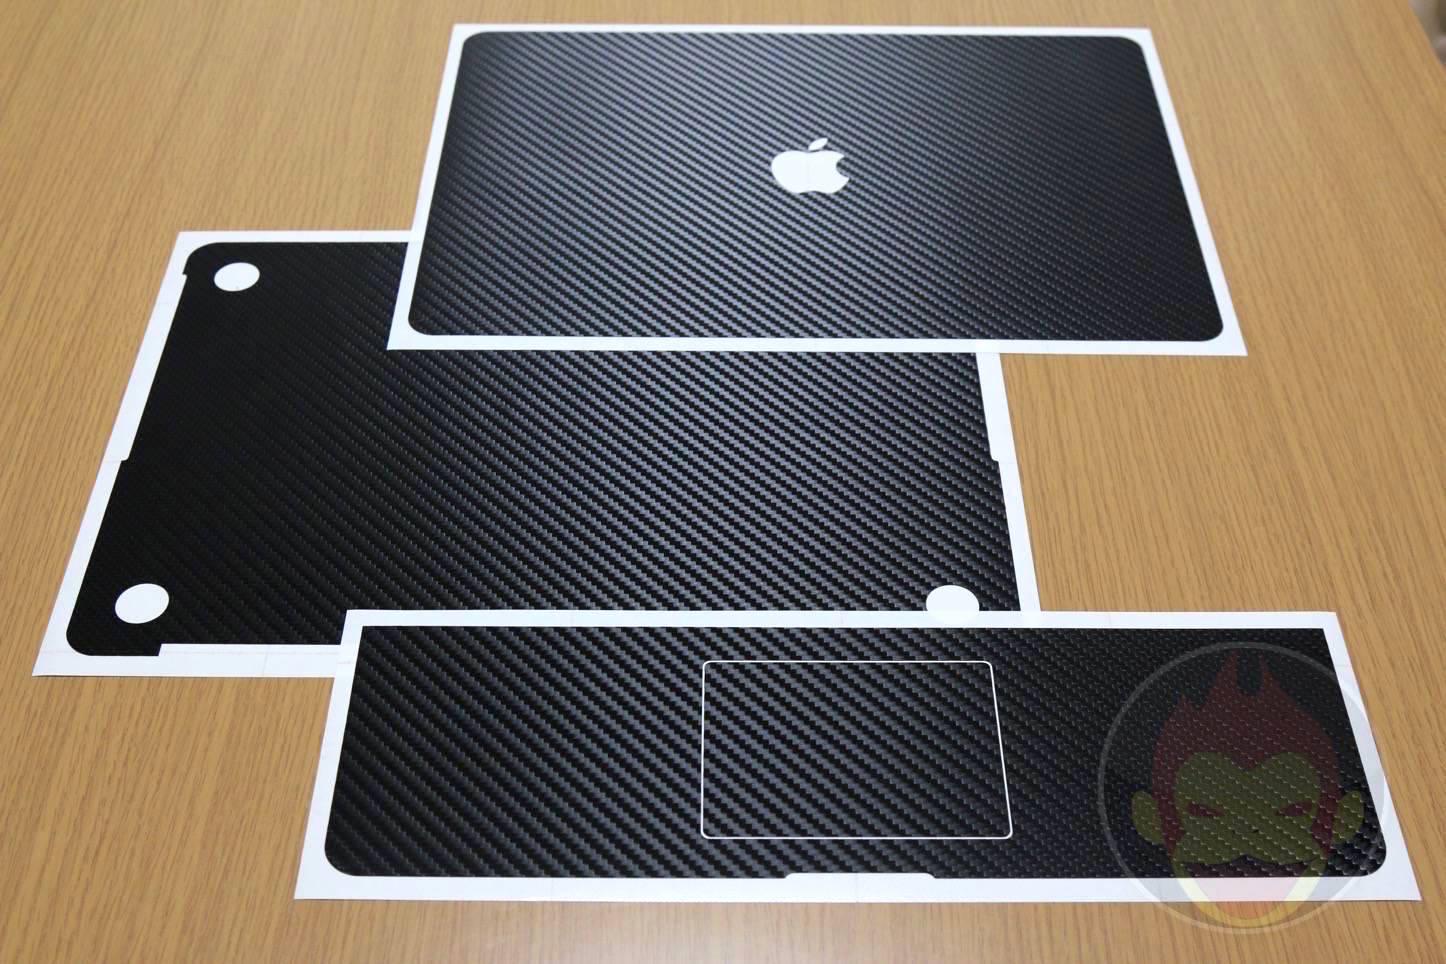 wraplus-for-Macbook-Pro-Retina-15-15.JPG